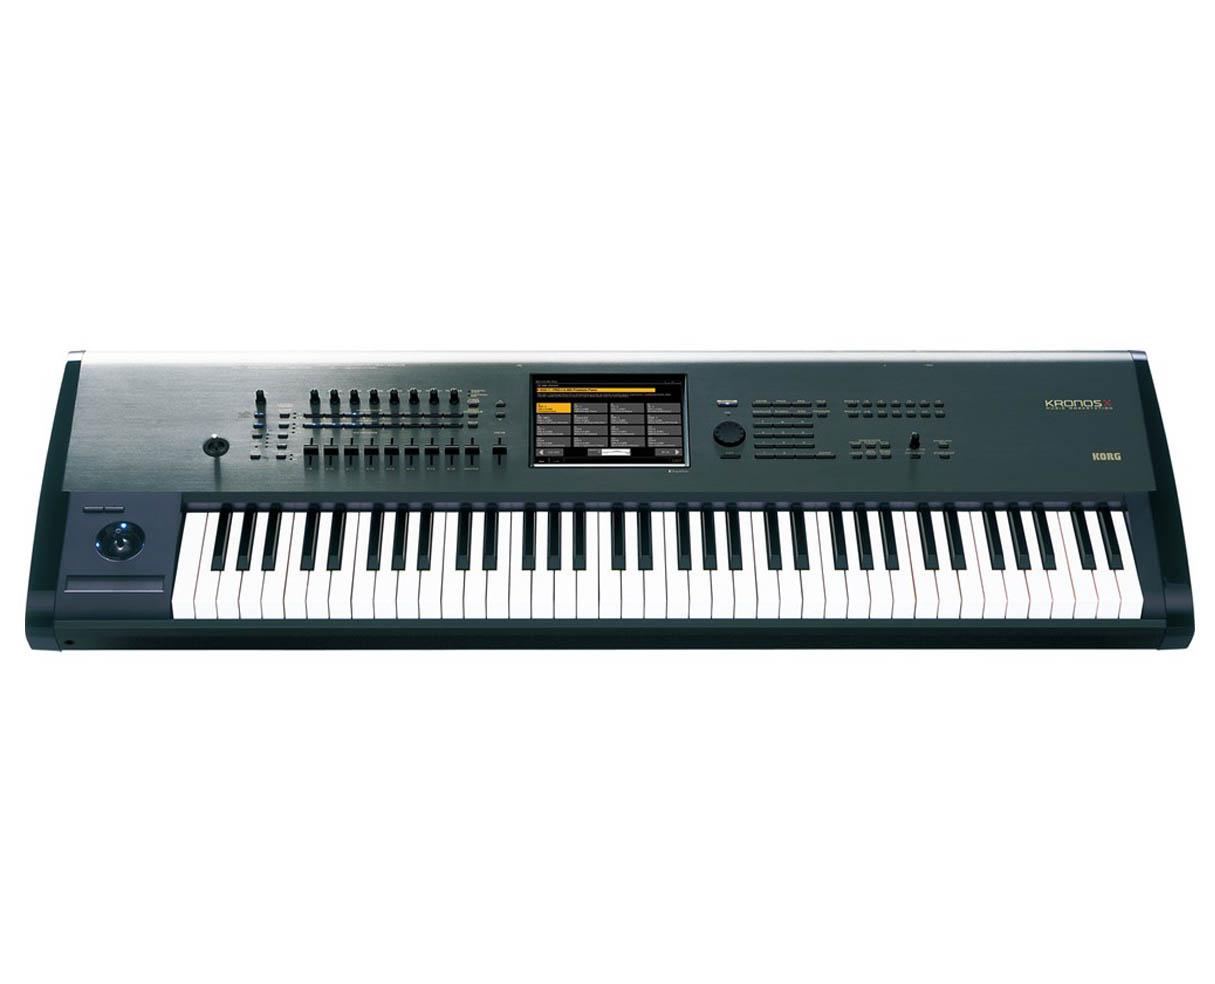 korg kronos x 73 keyboard synthesizer workstation 73 key proaudiostar ebay. Black Bedroom Furniture Sets. Home Design Ideas